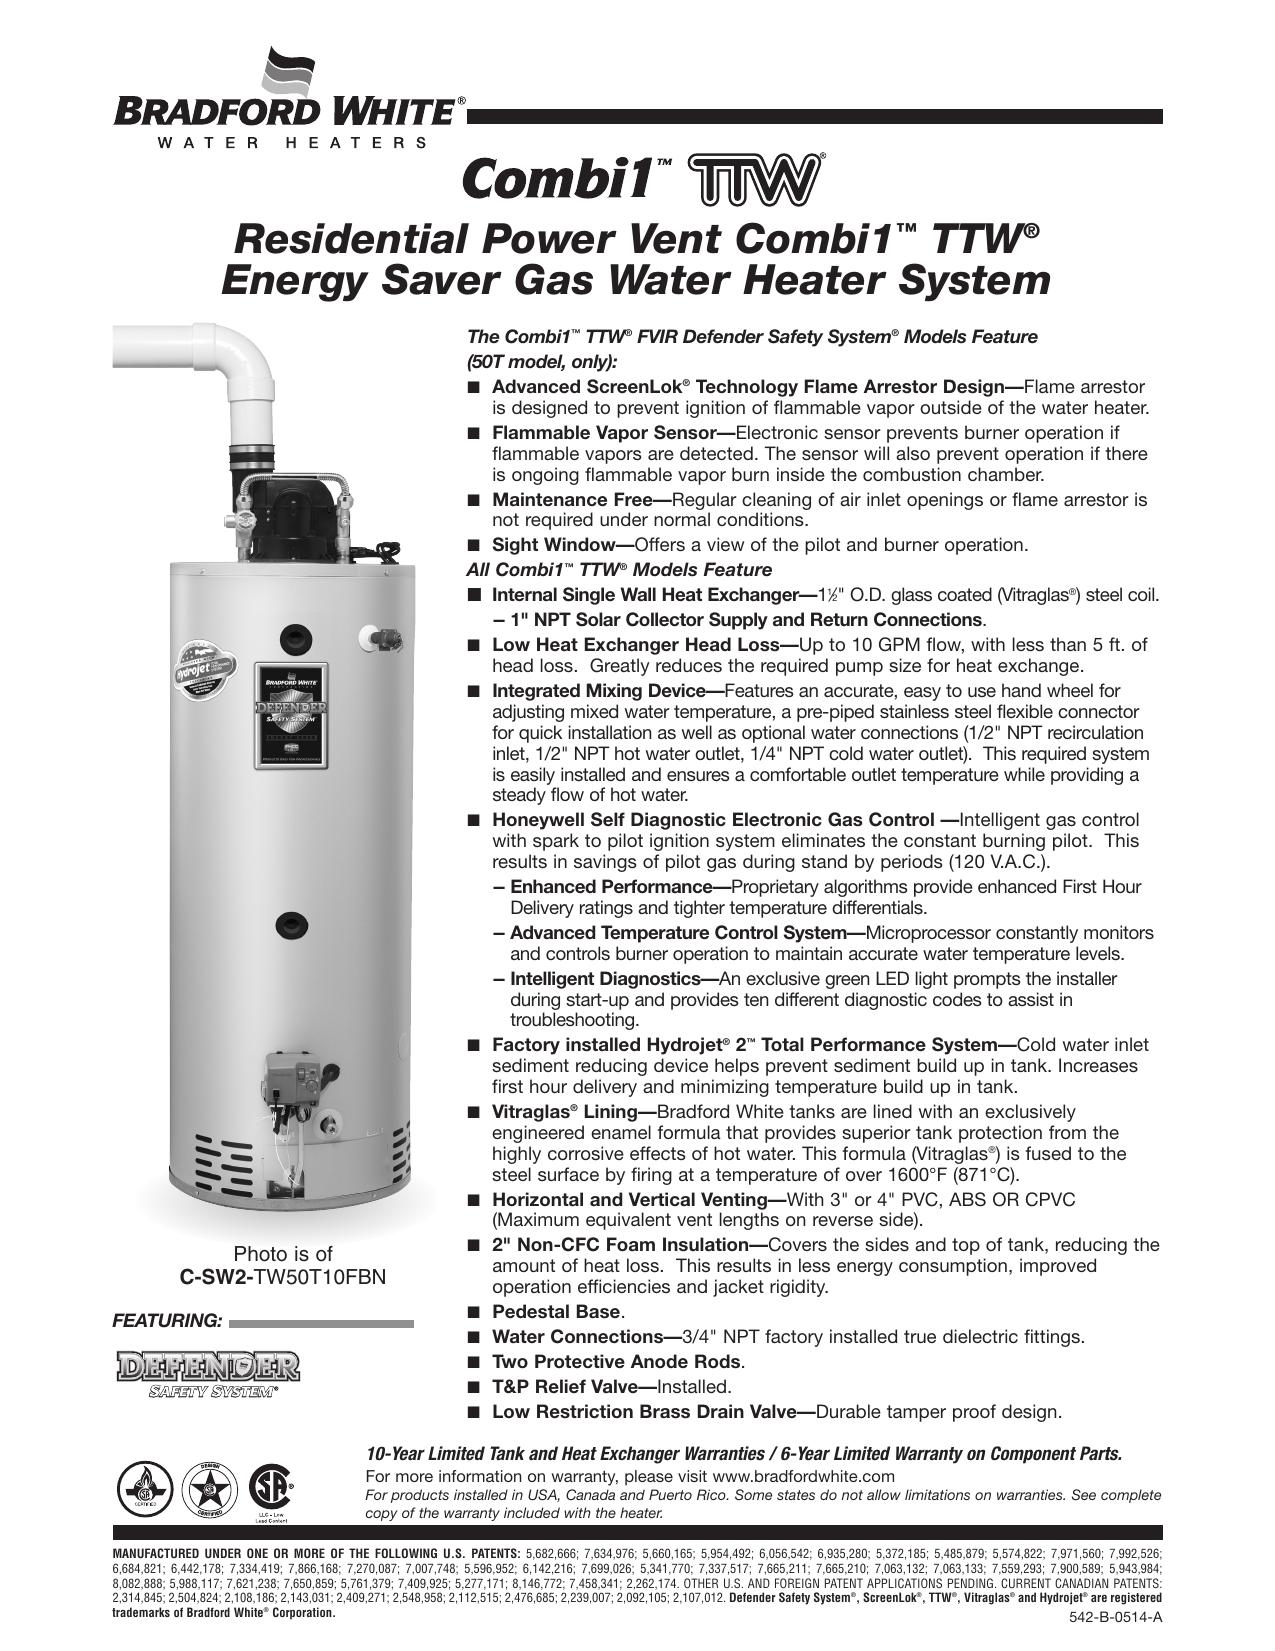 Bradford White Combi Cor Water Heater Model Csw2 A Manualzz